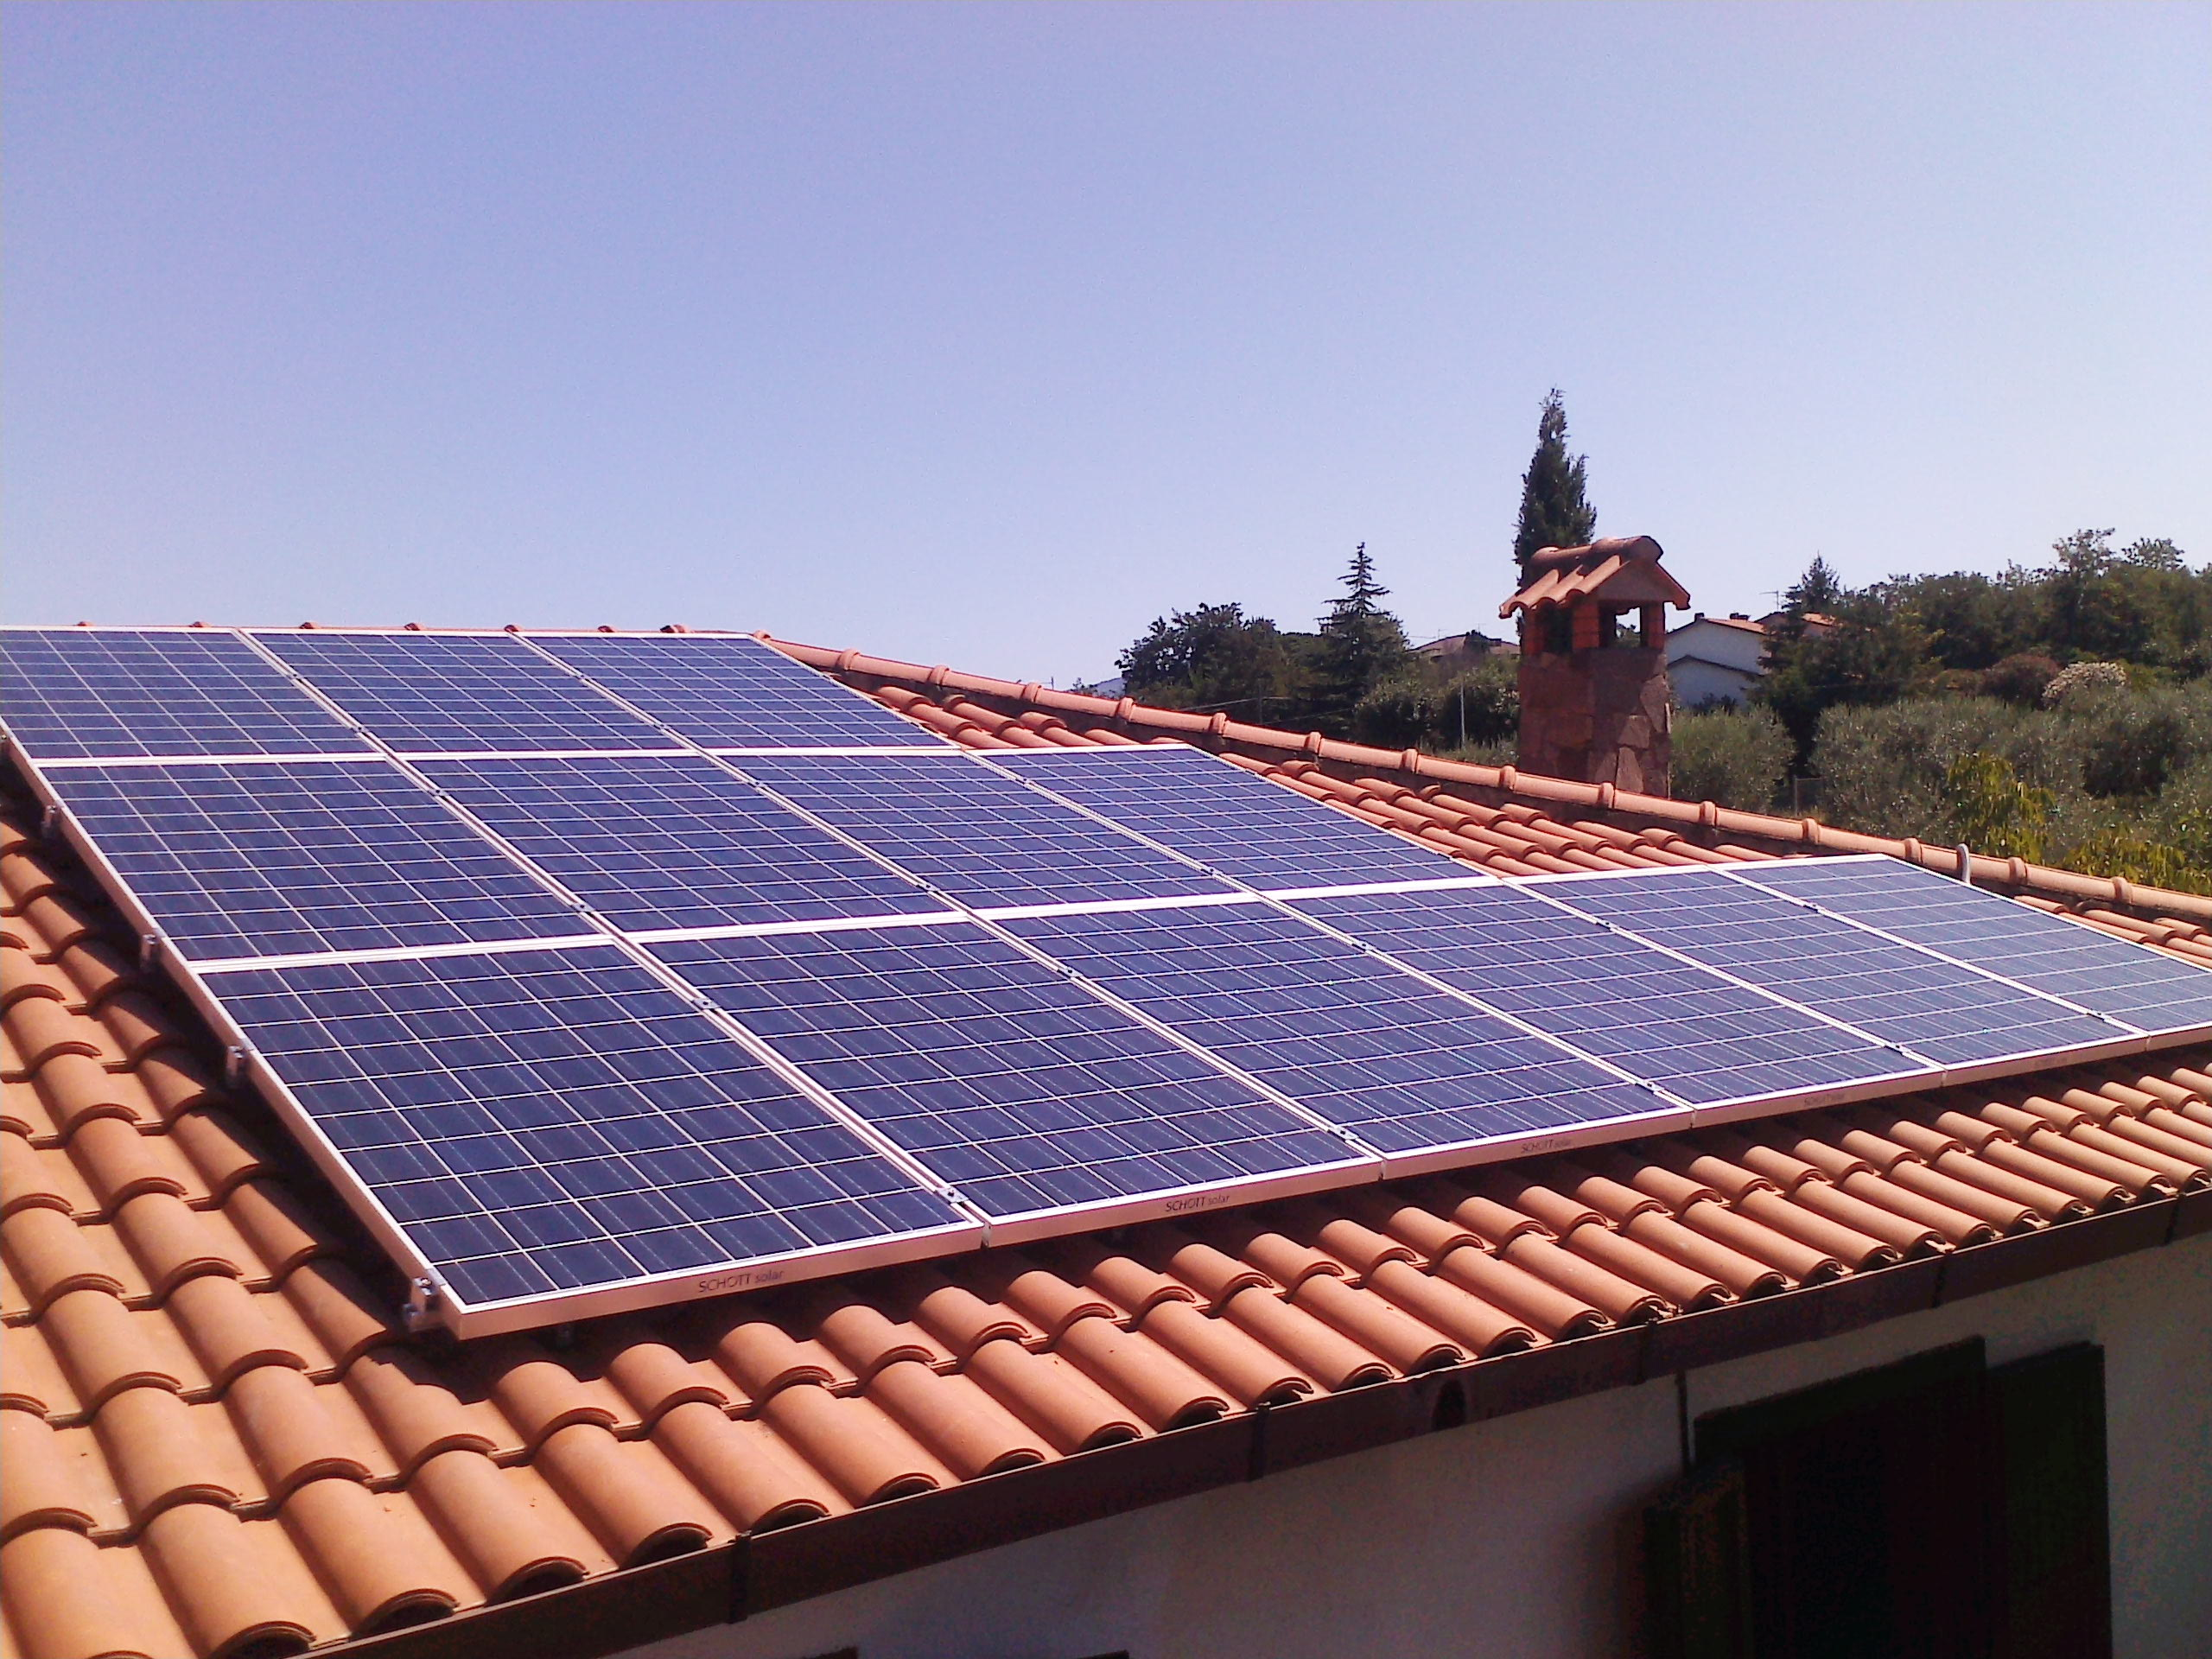 Impianto fotovoltaico viterbo 3 kWp